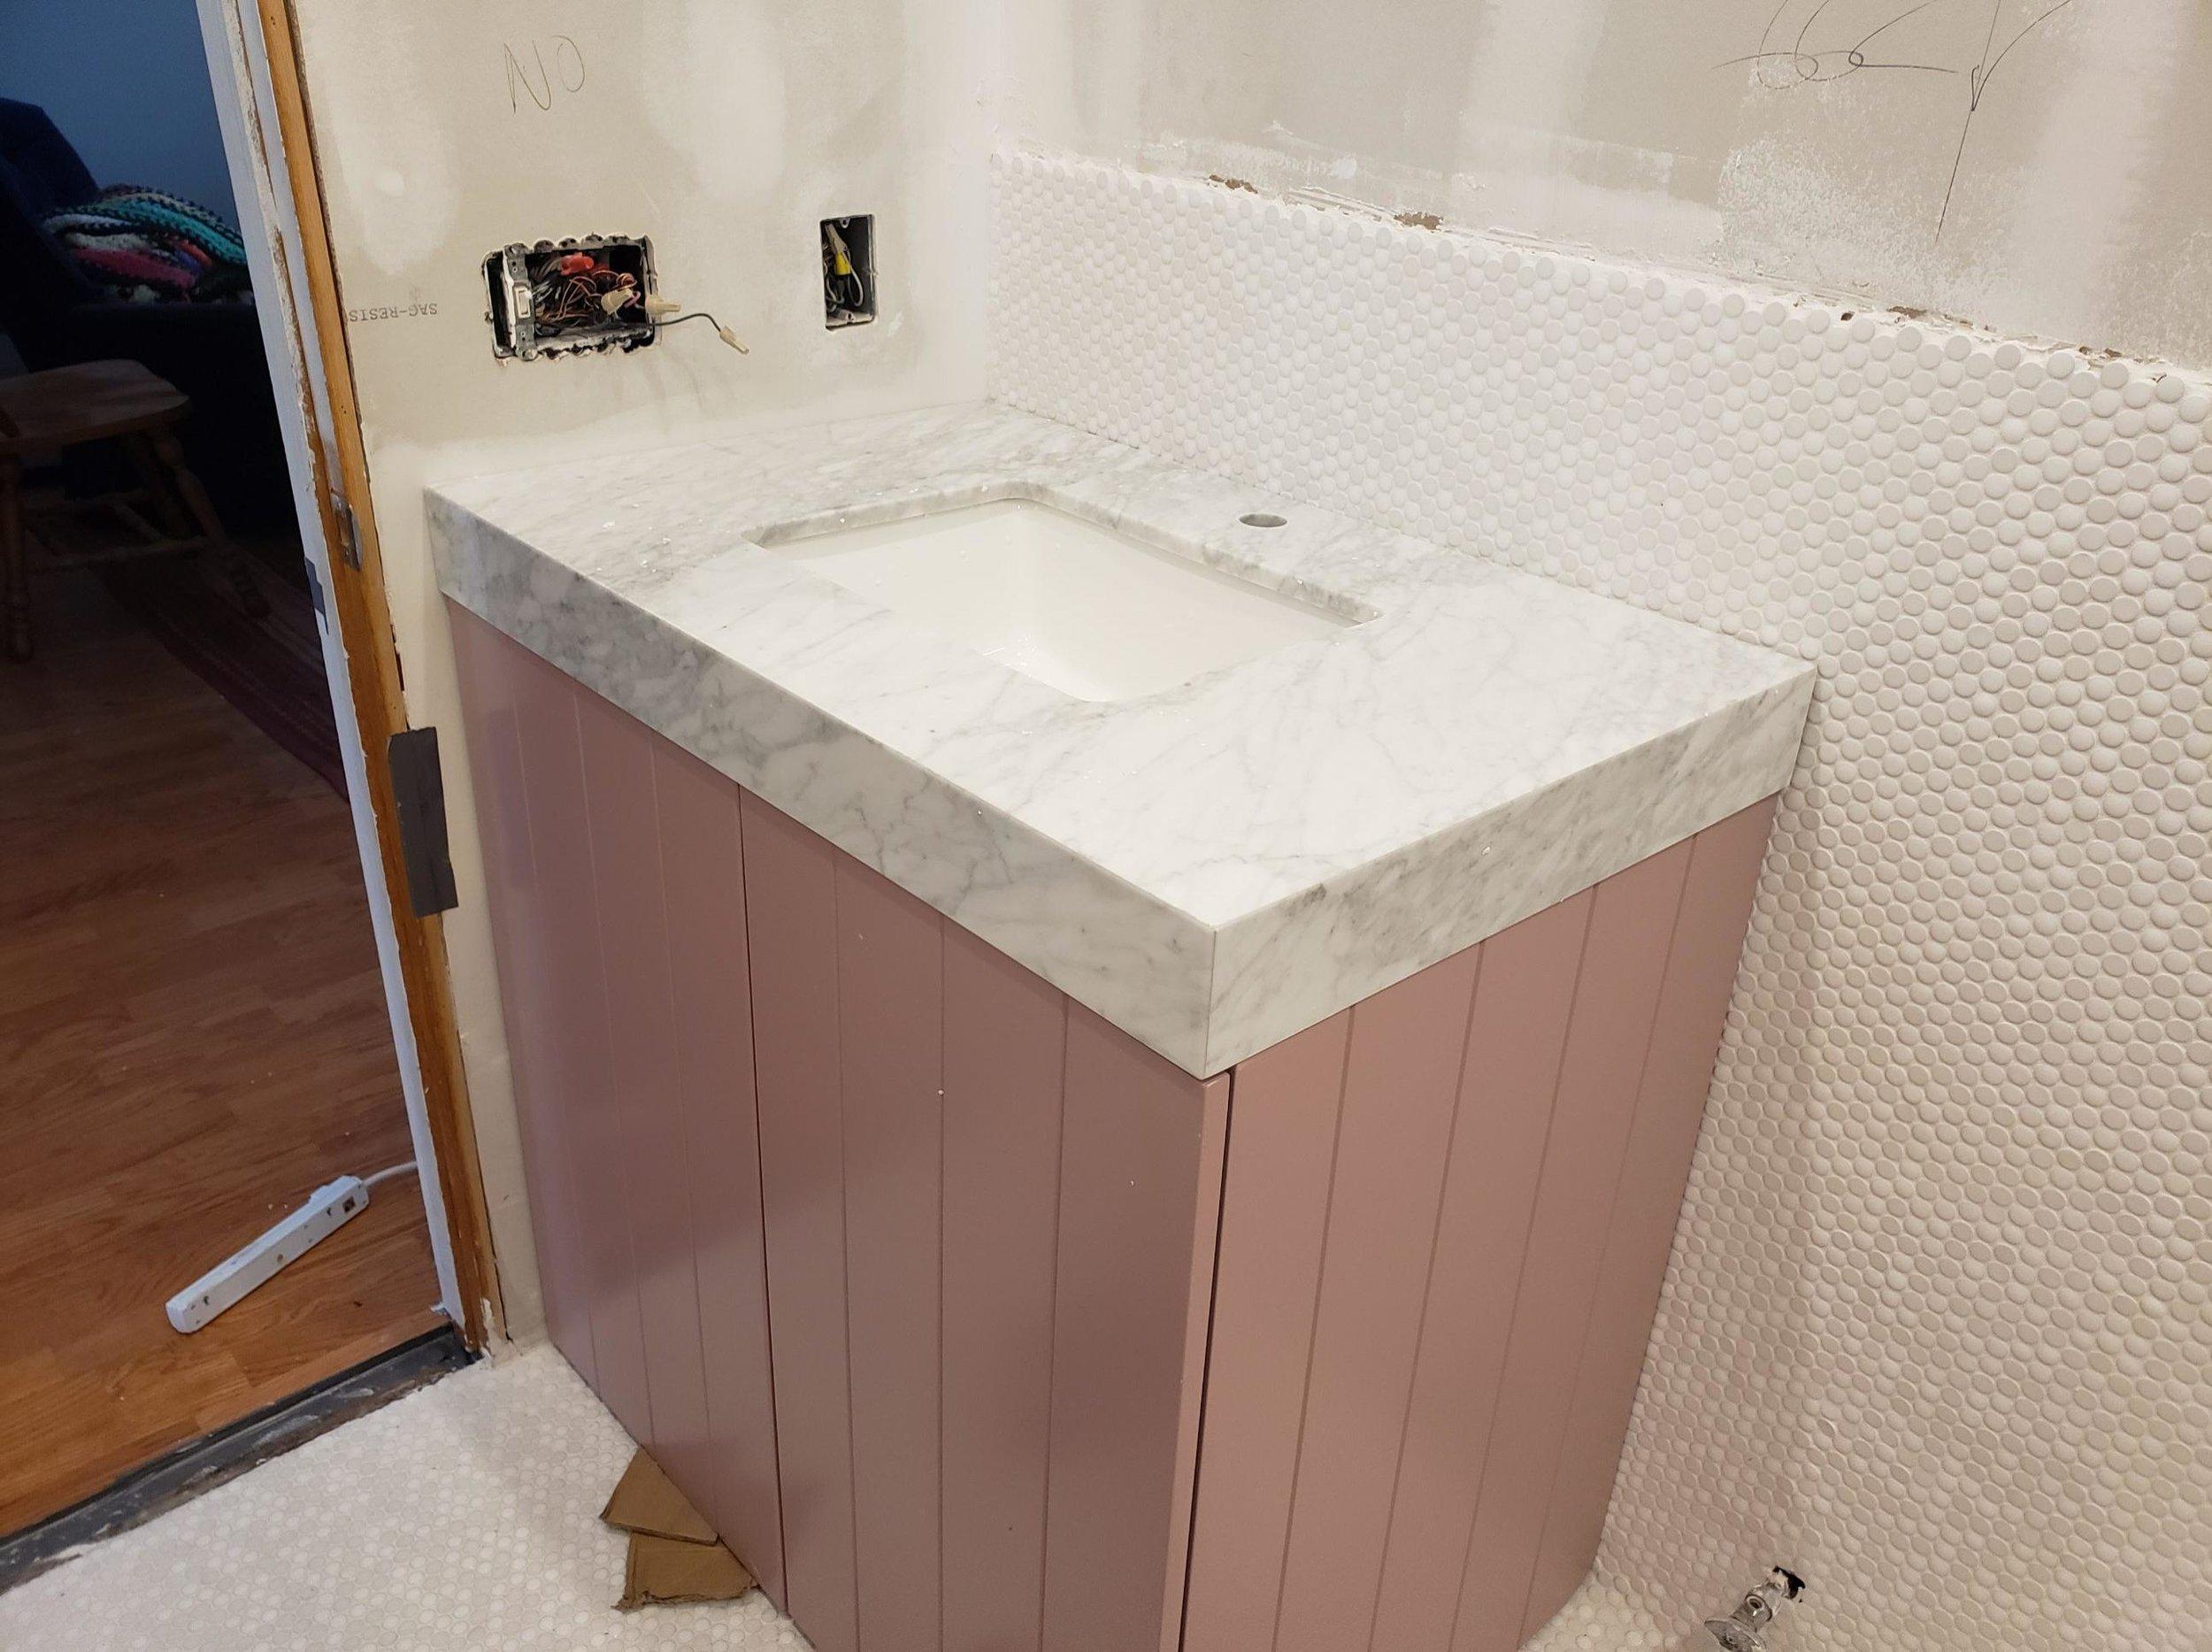 mauve pink bathroom vanity Carrara marble countertop